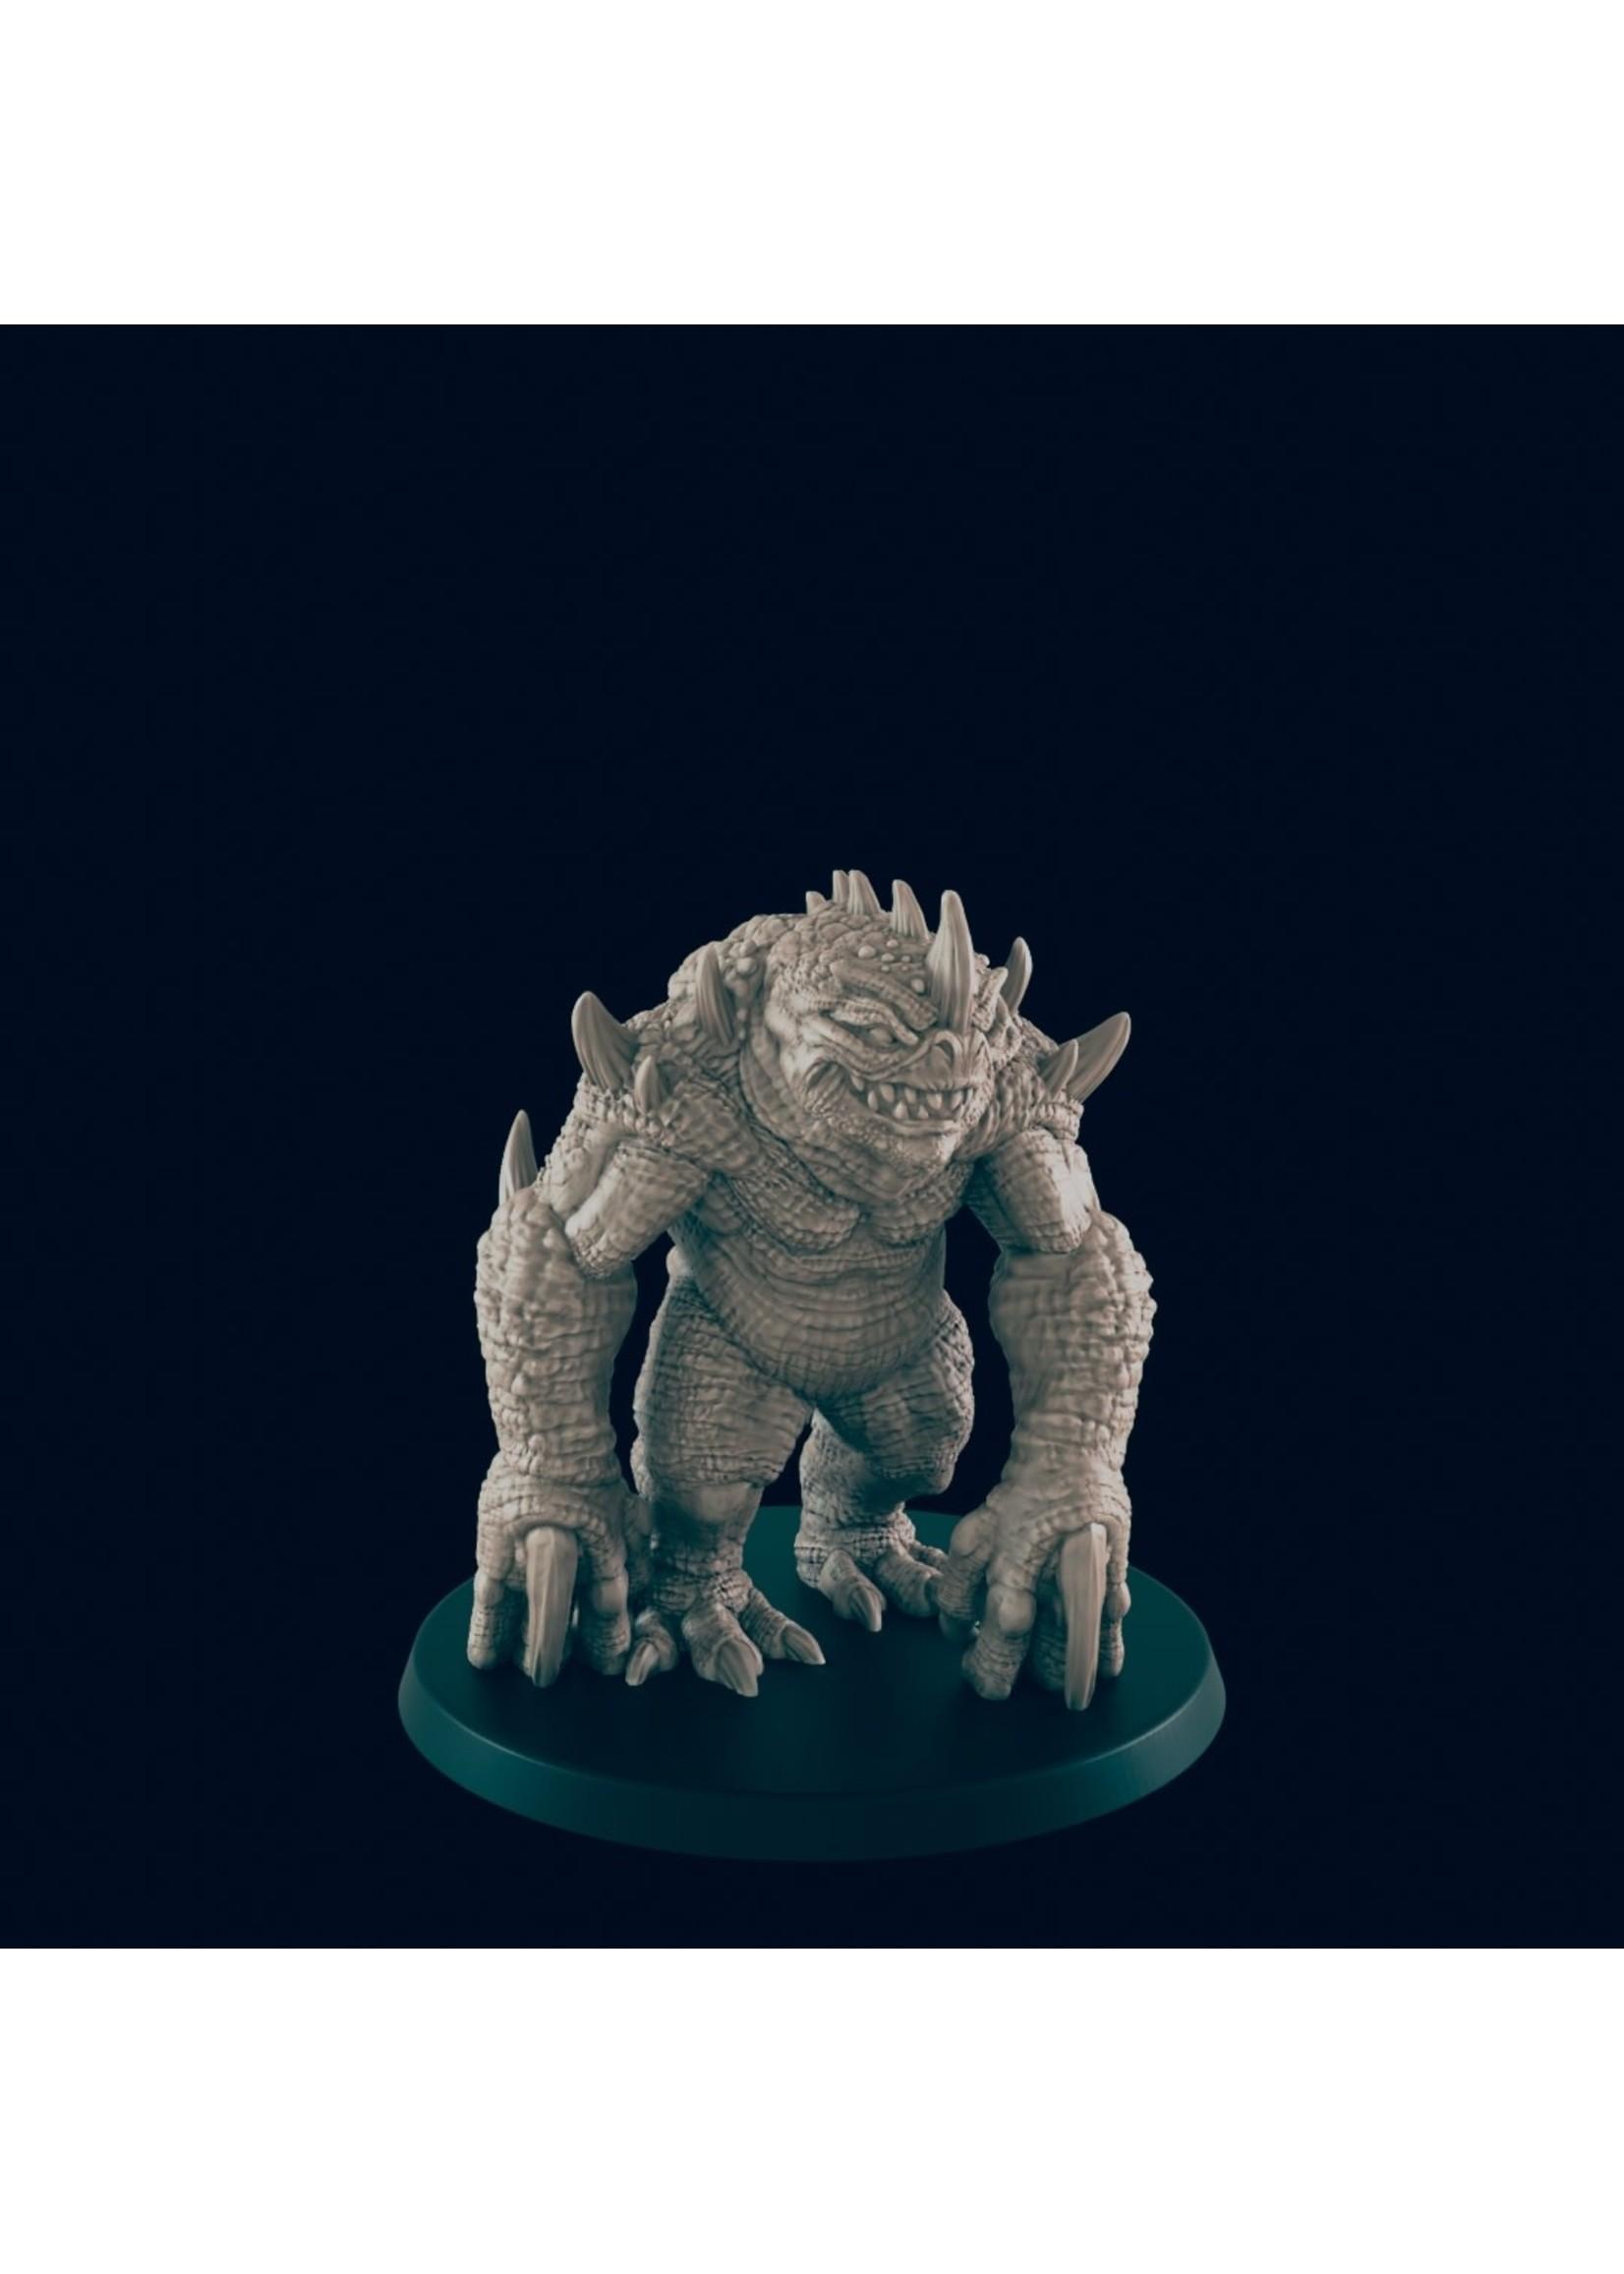 3D Printed Miniature - Blue Slaad - Dungeons & Dragons - Beasts and Baddies KS